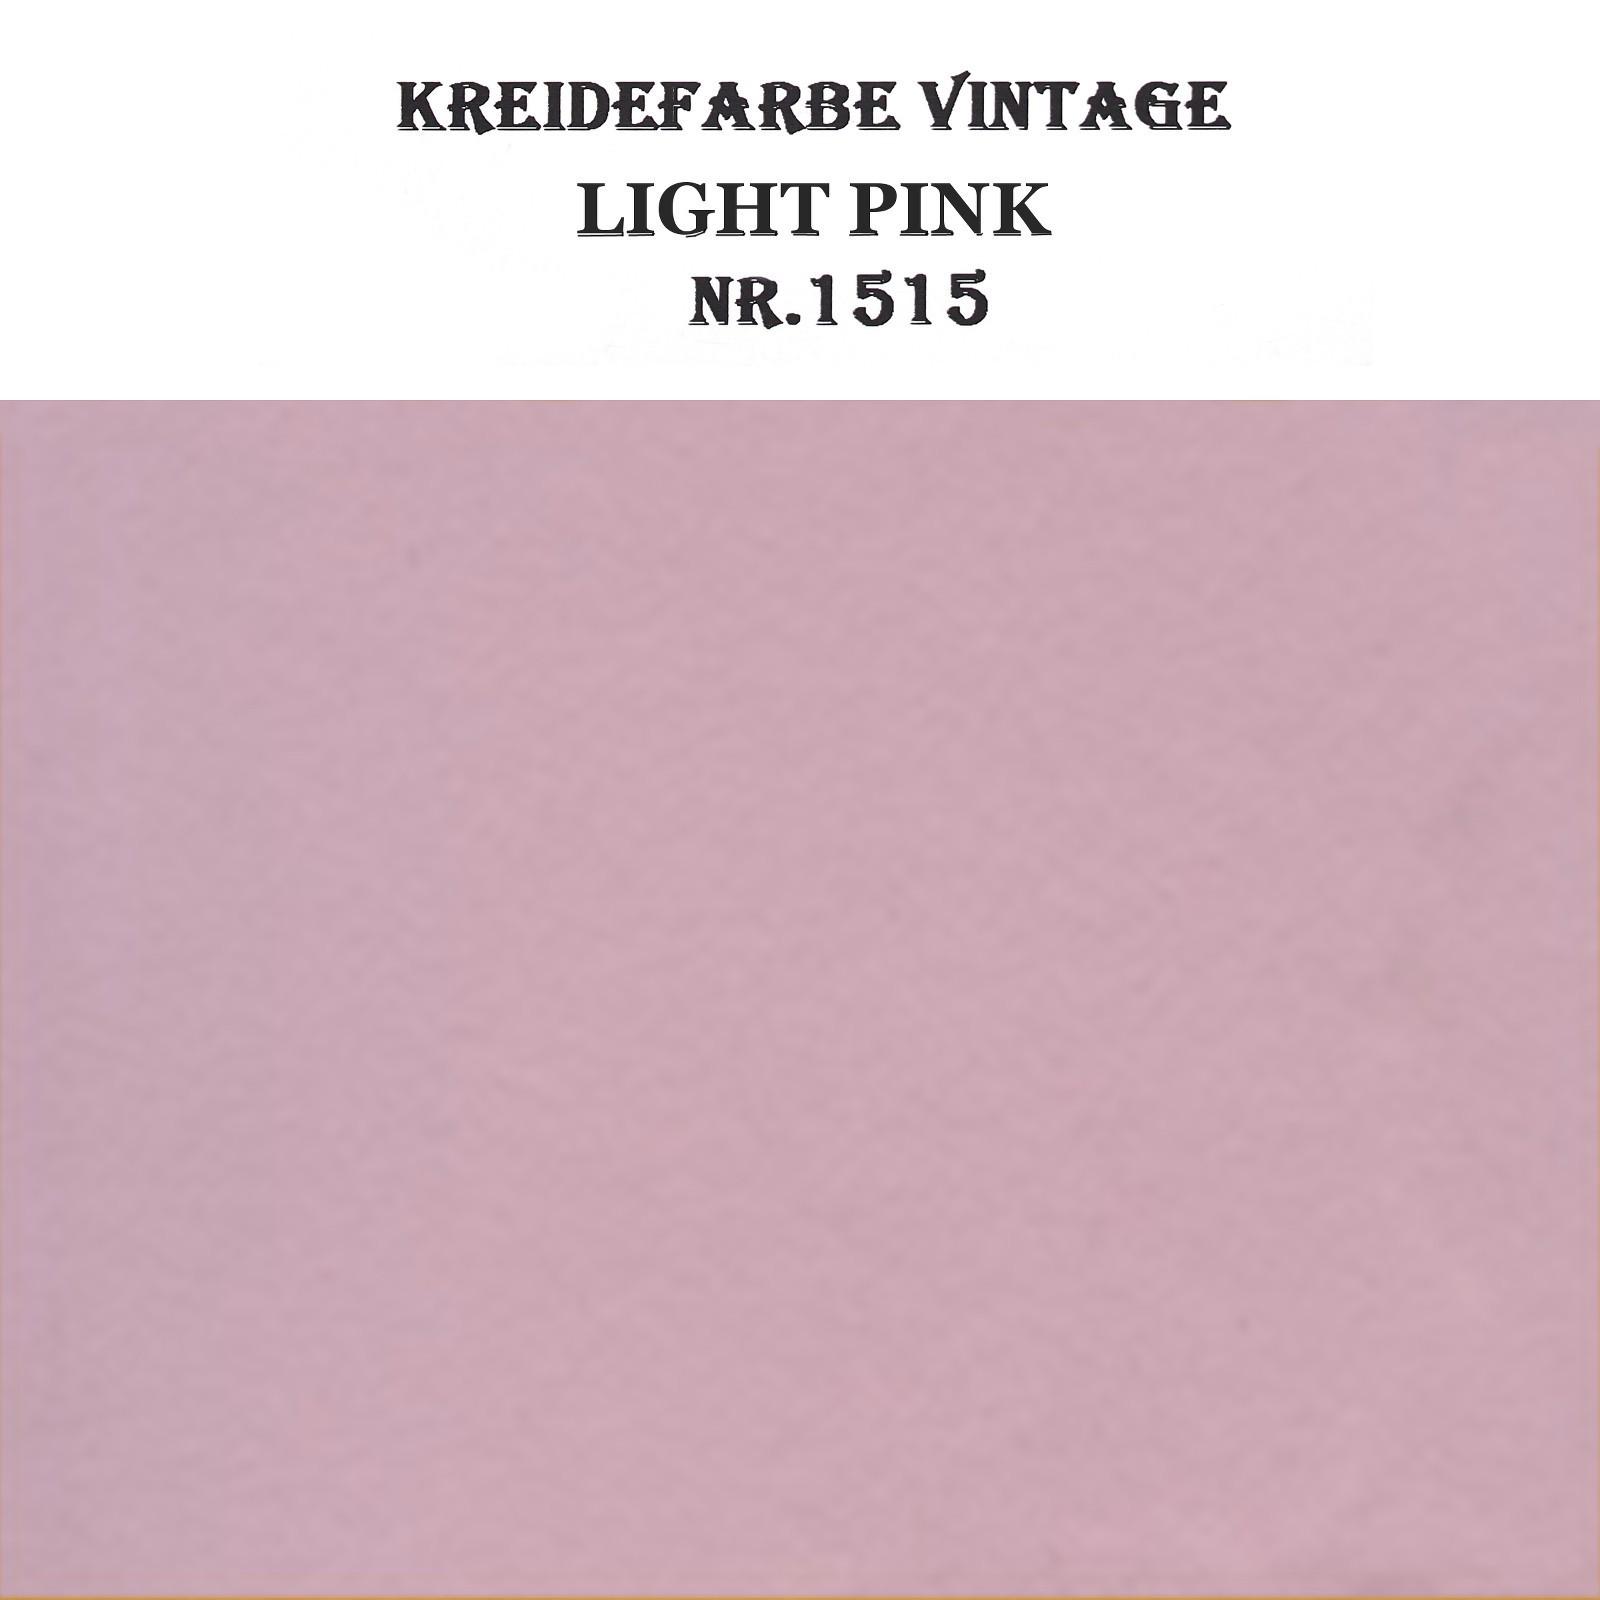 kreidefarbe light pink alt rosa borma schrank m bel farbe 750ml 26 53 ltr. Black Bedroom Furniture Sets. Home Design Ideas